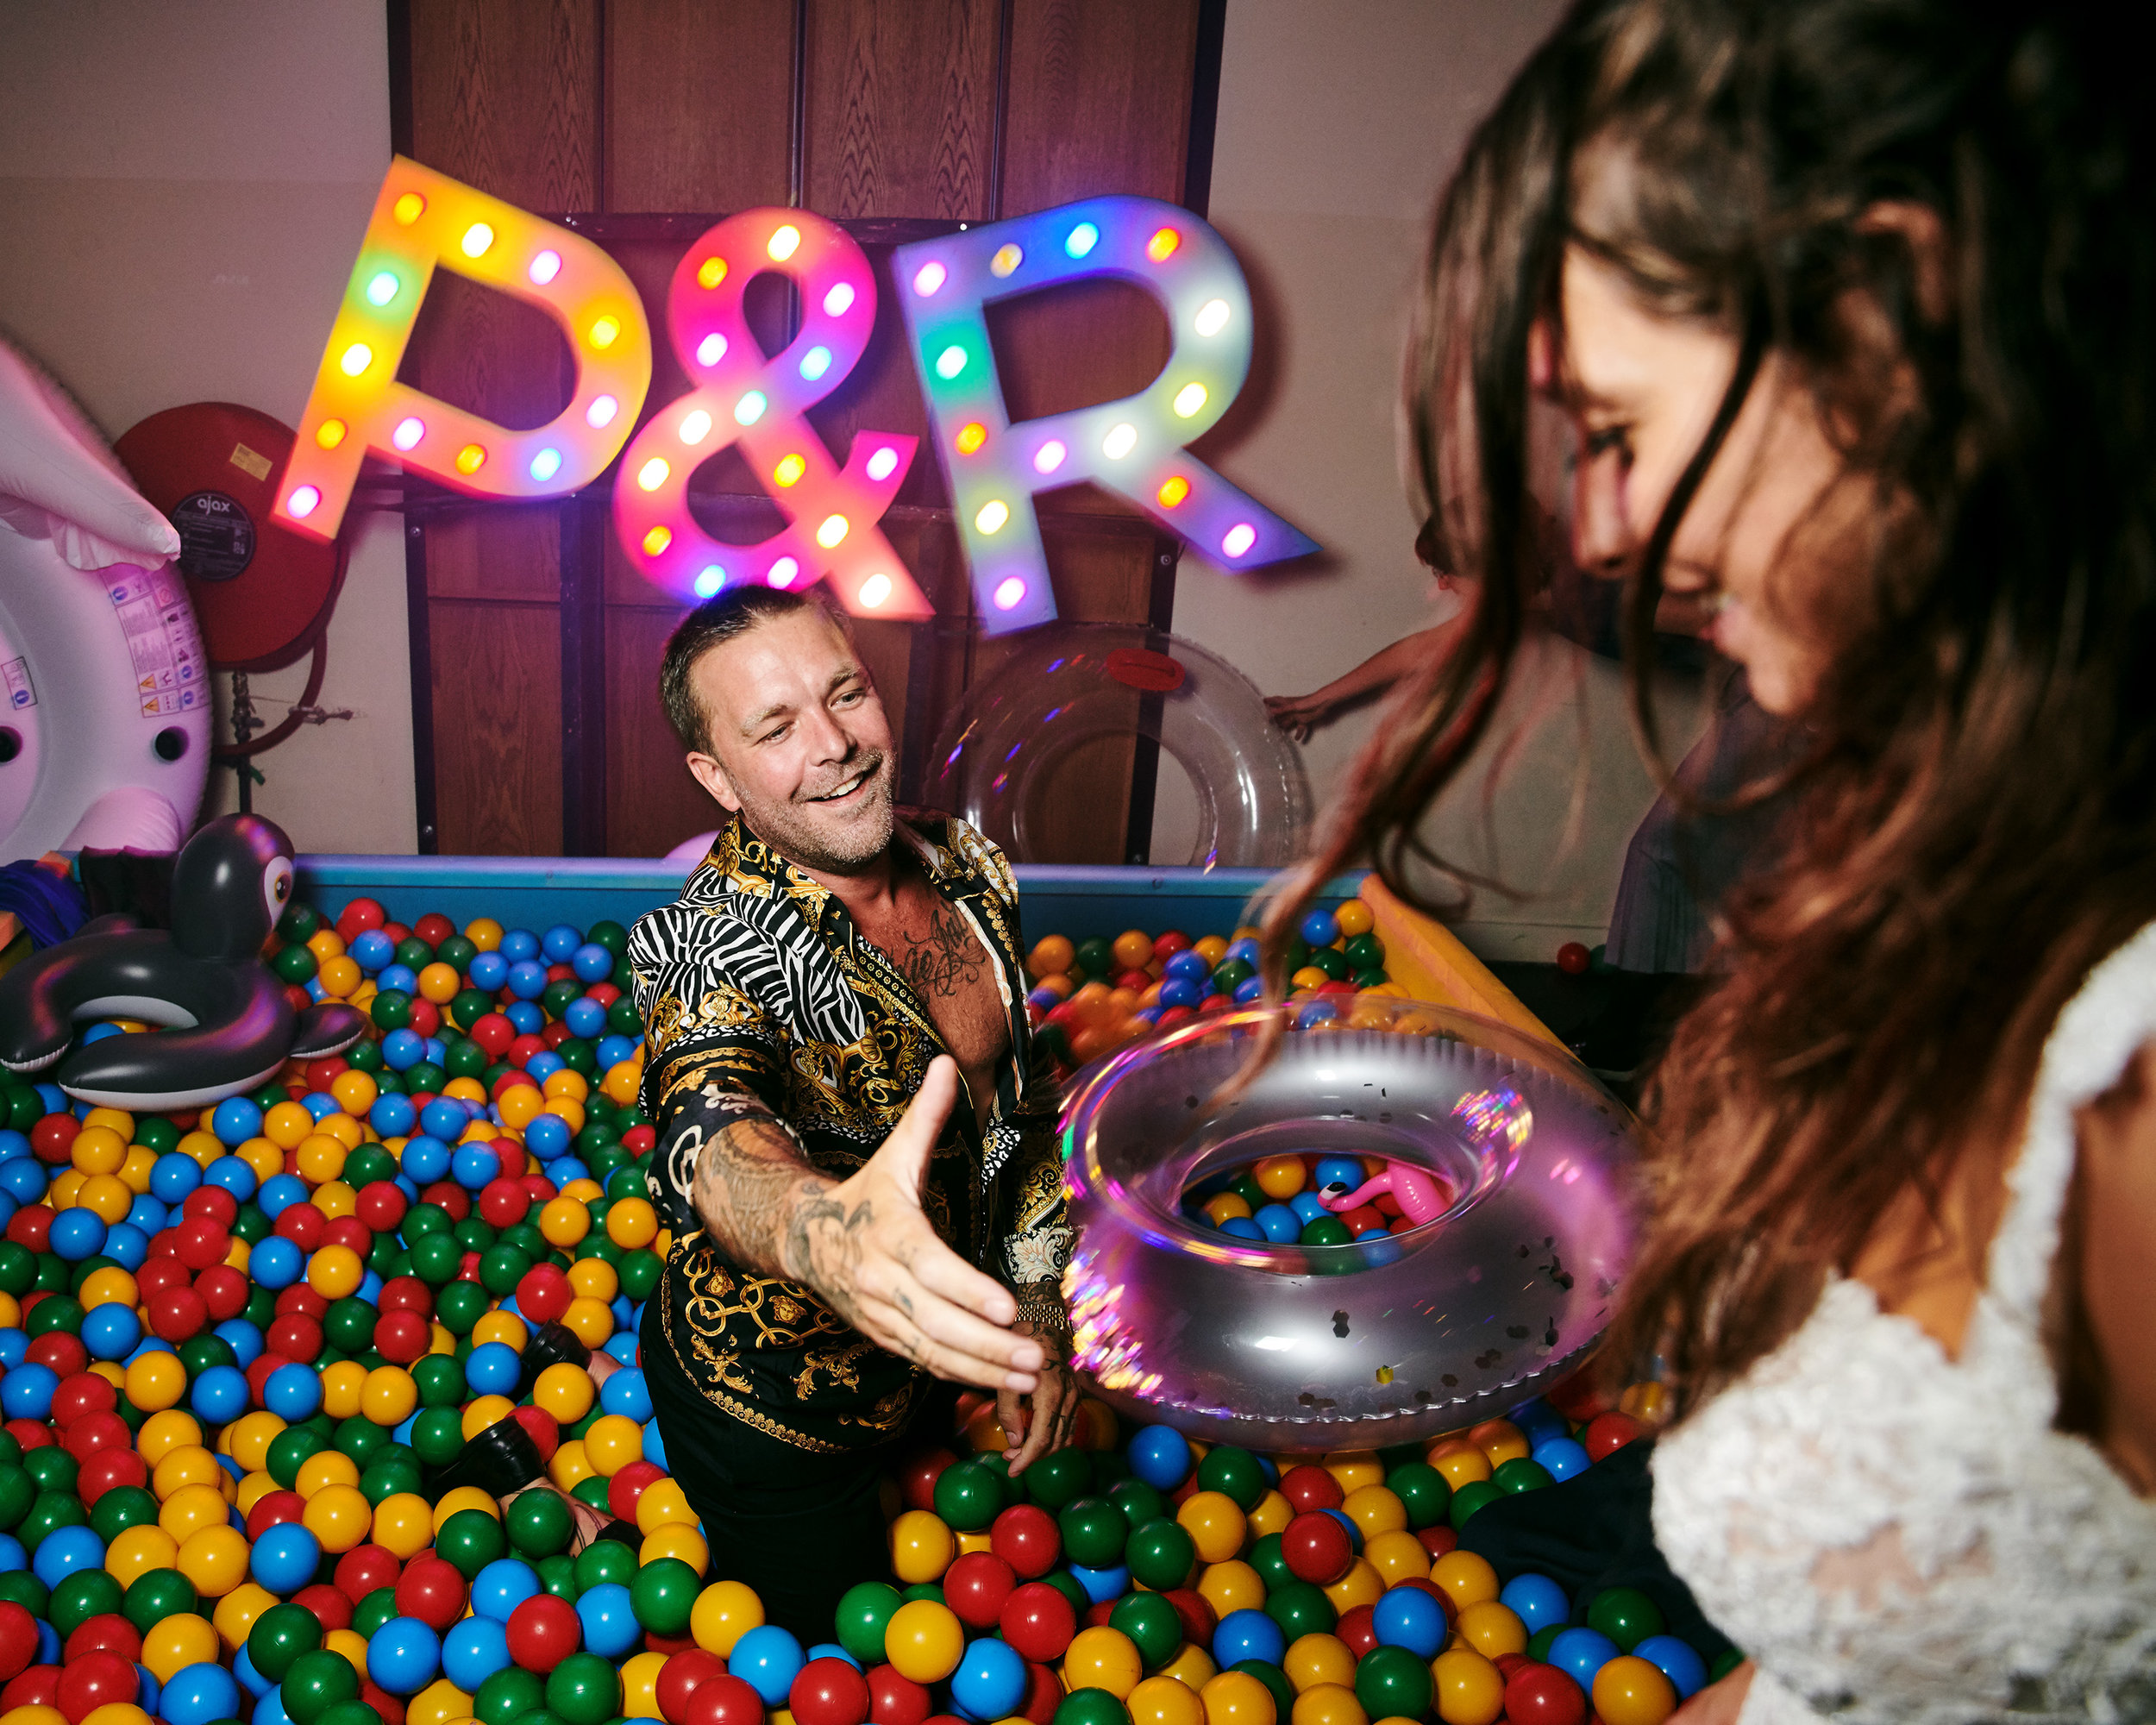 Pien and Rene wedding 18 09 10 by RVDA II 3819.jpg